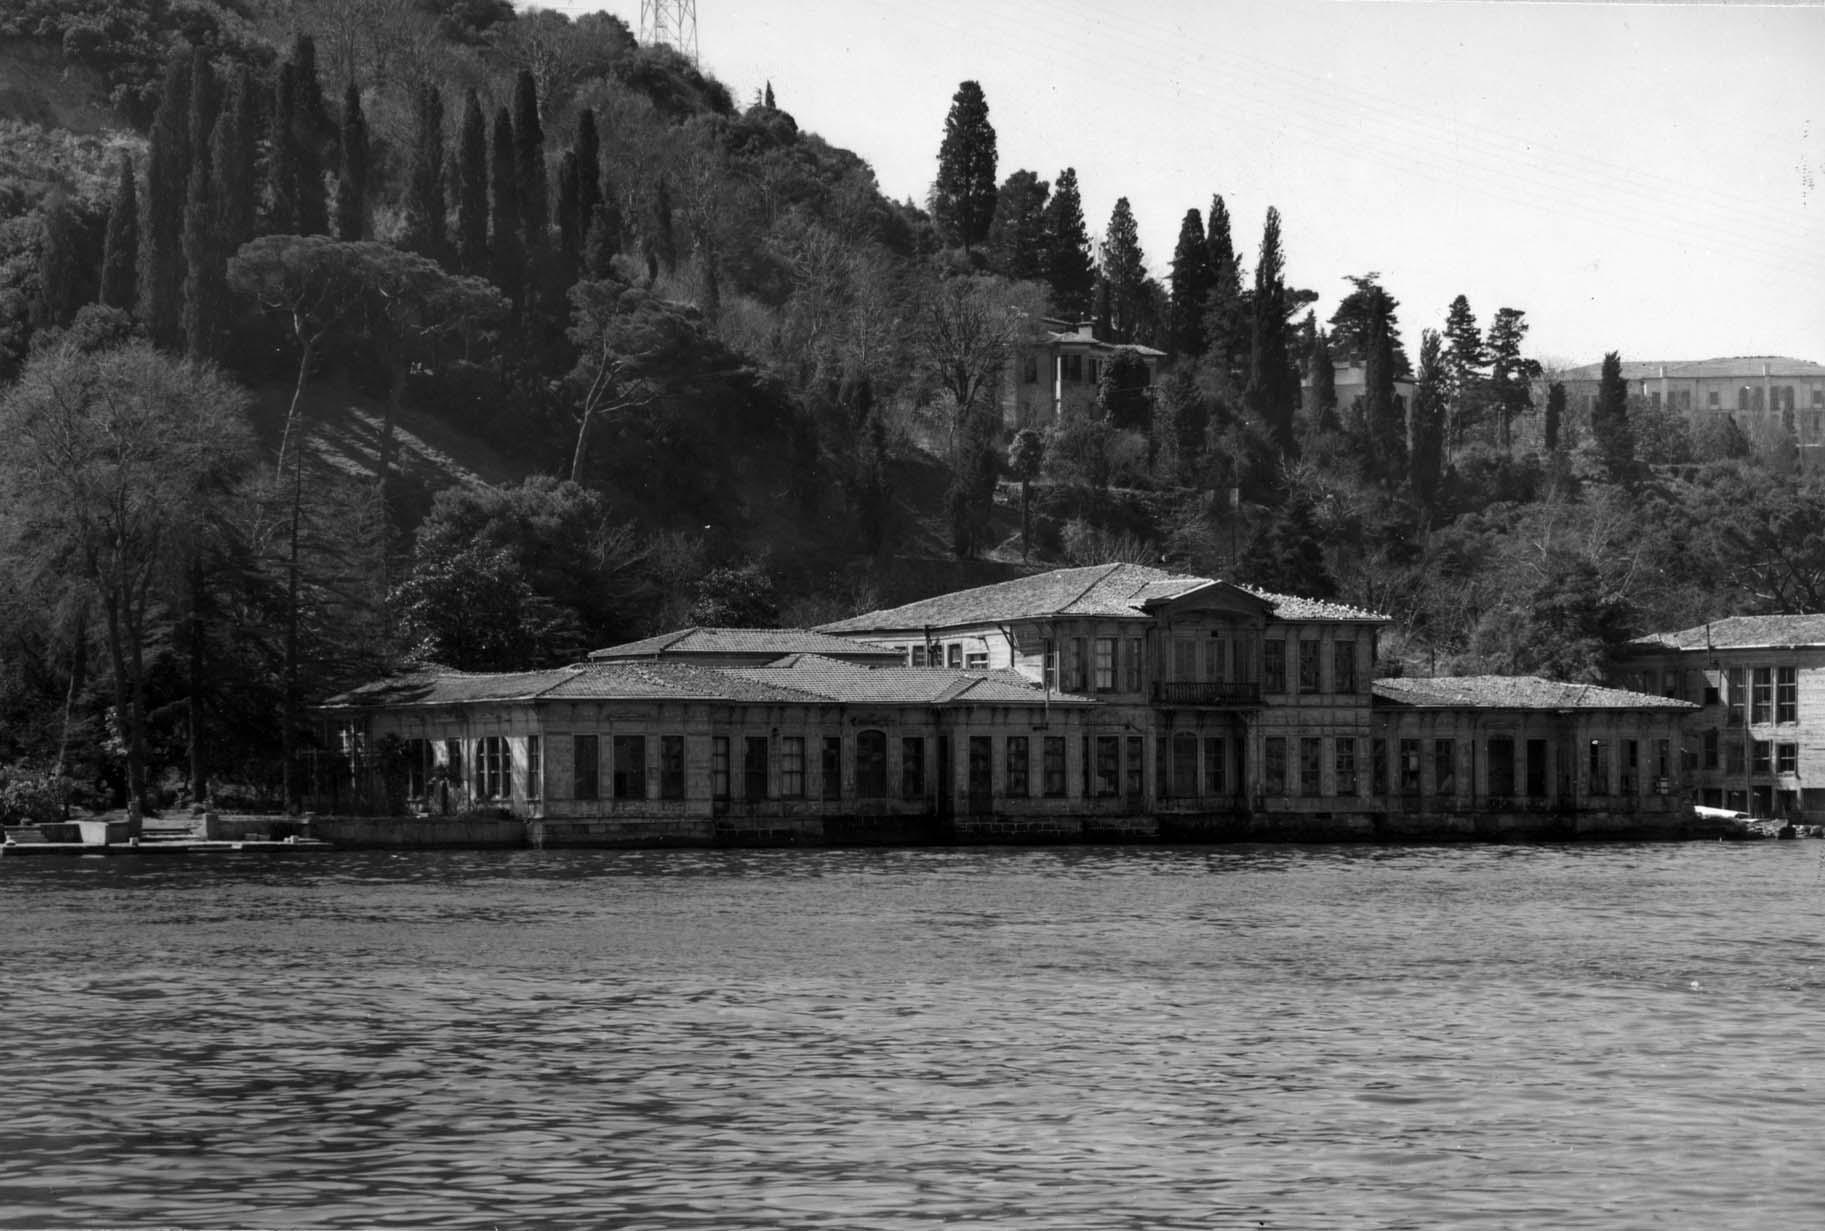 Nawoord bij 'Sereen' van Ahmet Hamdi Tanpınar